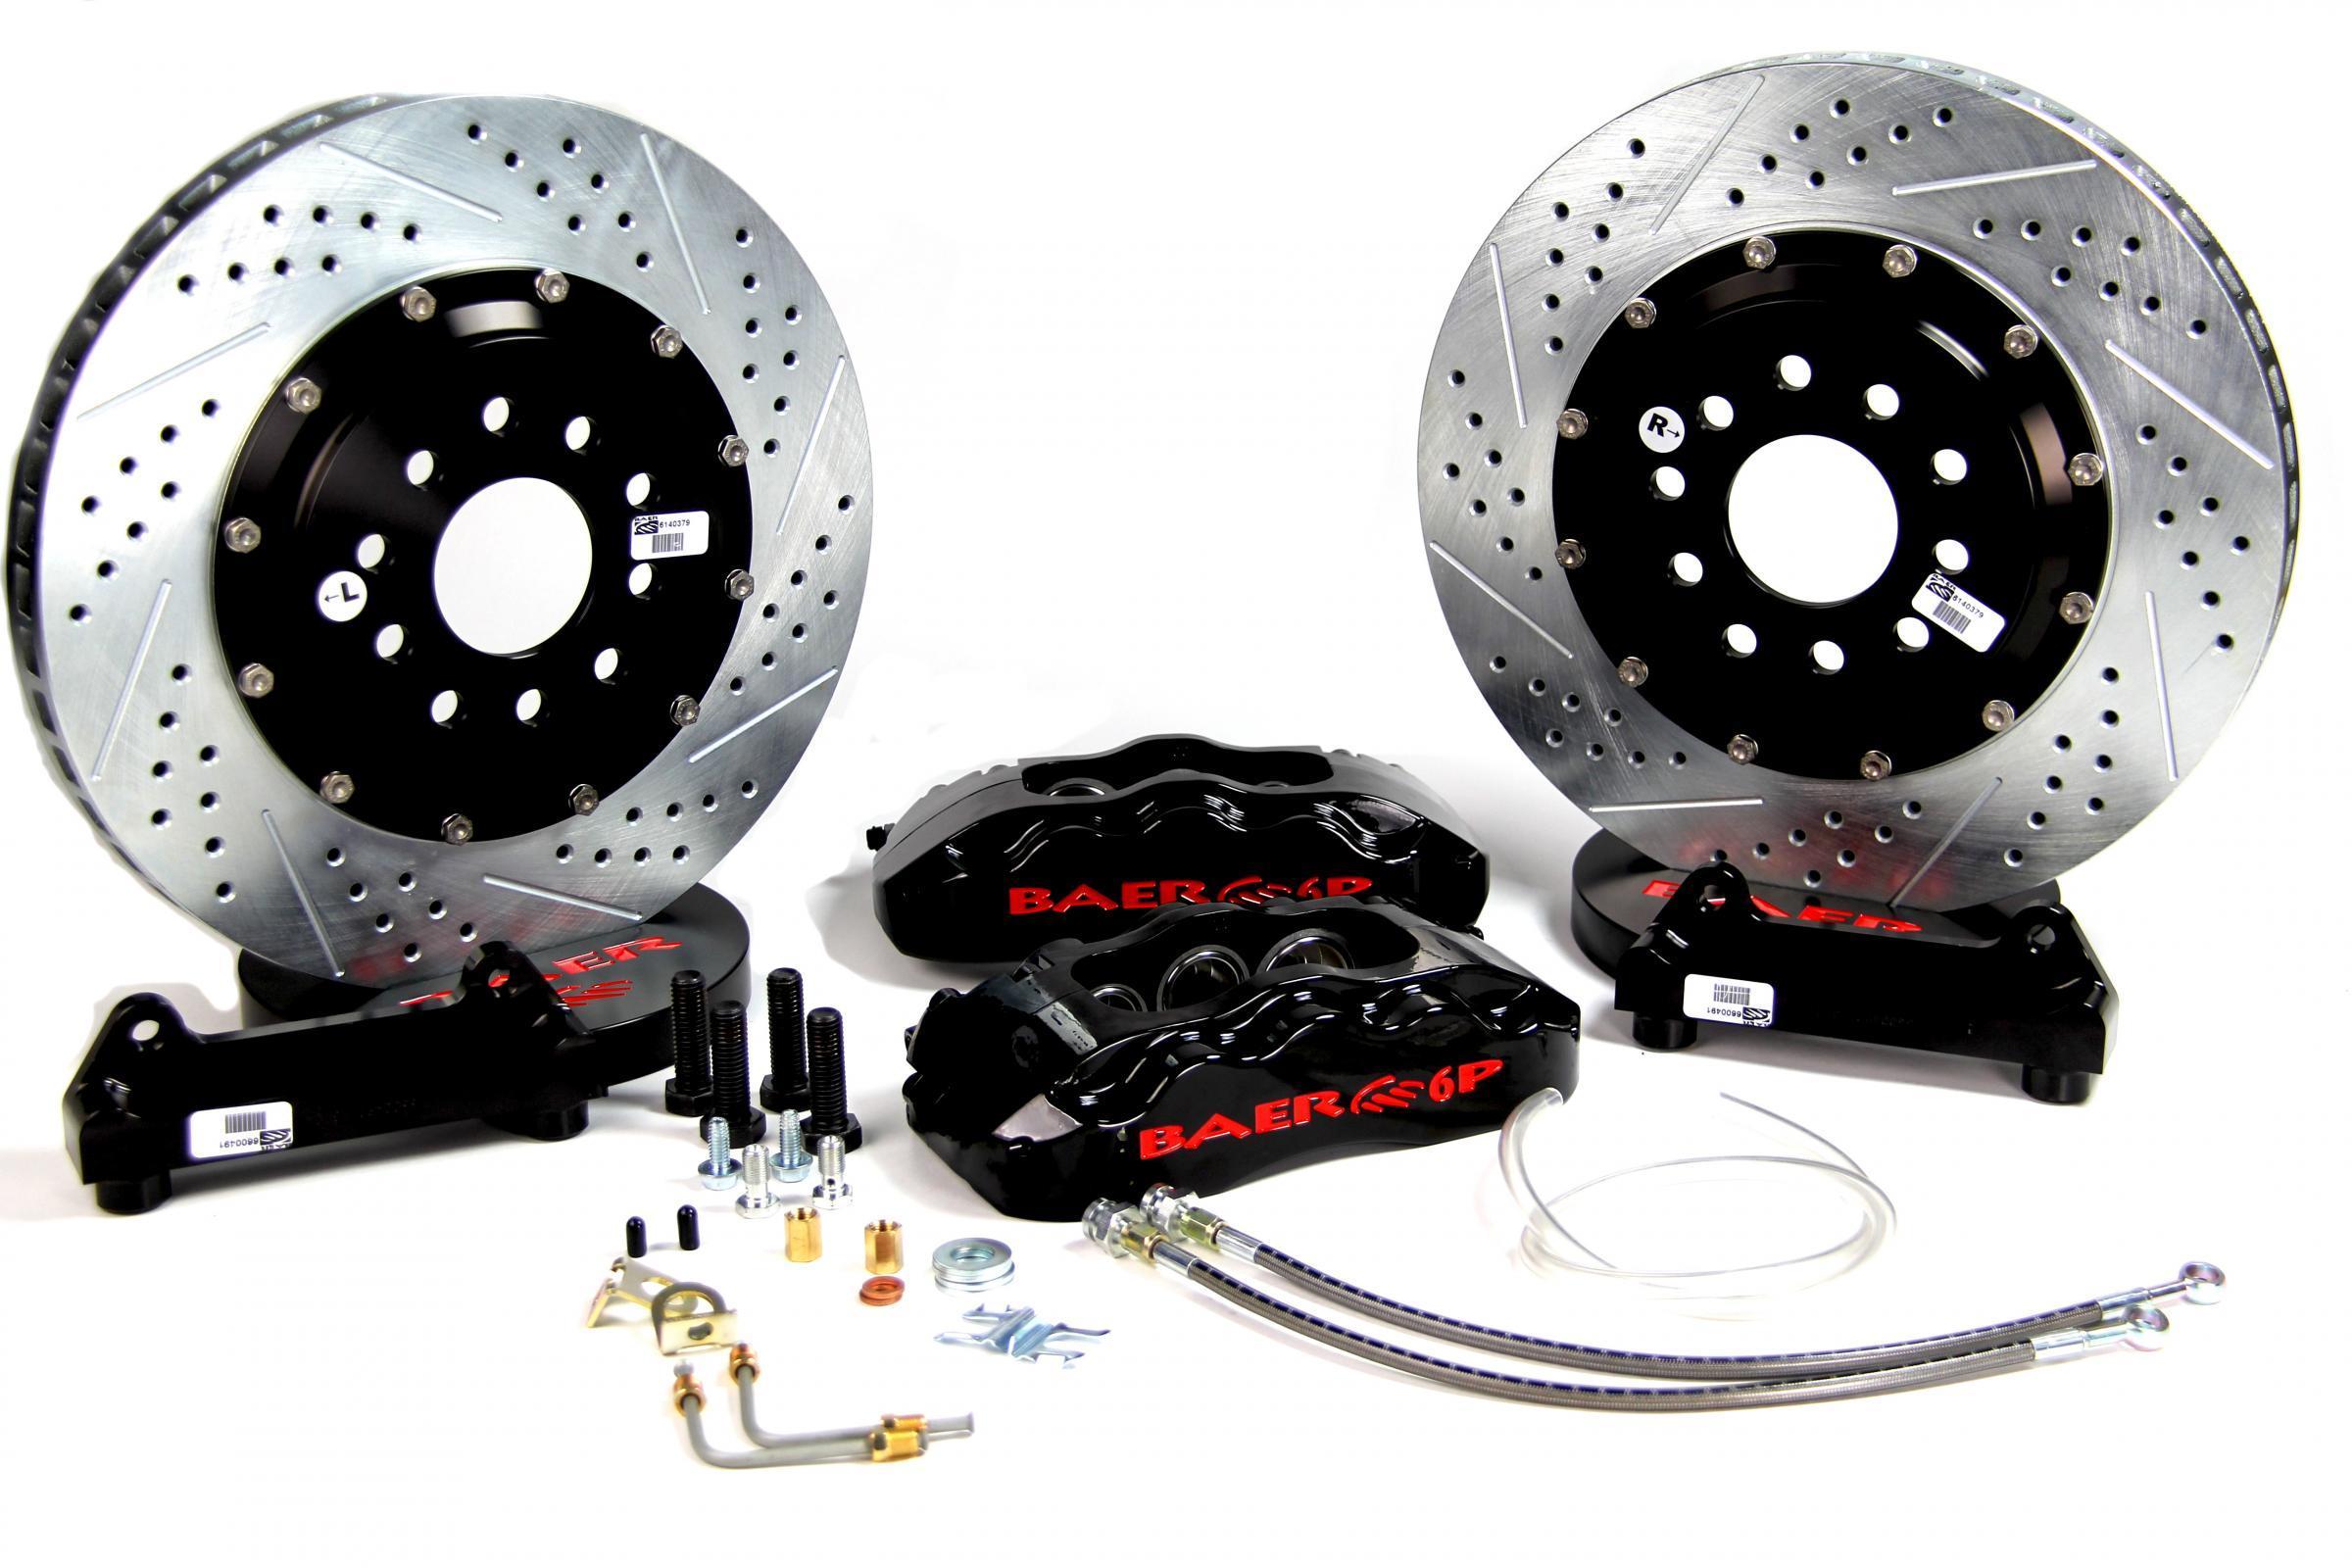 Baer Brakes 4301352B Brake System, Pro Plus, Front, 6 Piston Caliper, 14 in Drilled / Slotted, 2 Piece Rotor, Aluminum, Black, GM F-Body 1967-81, Kit